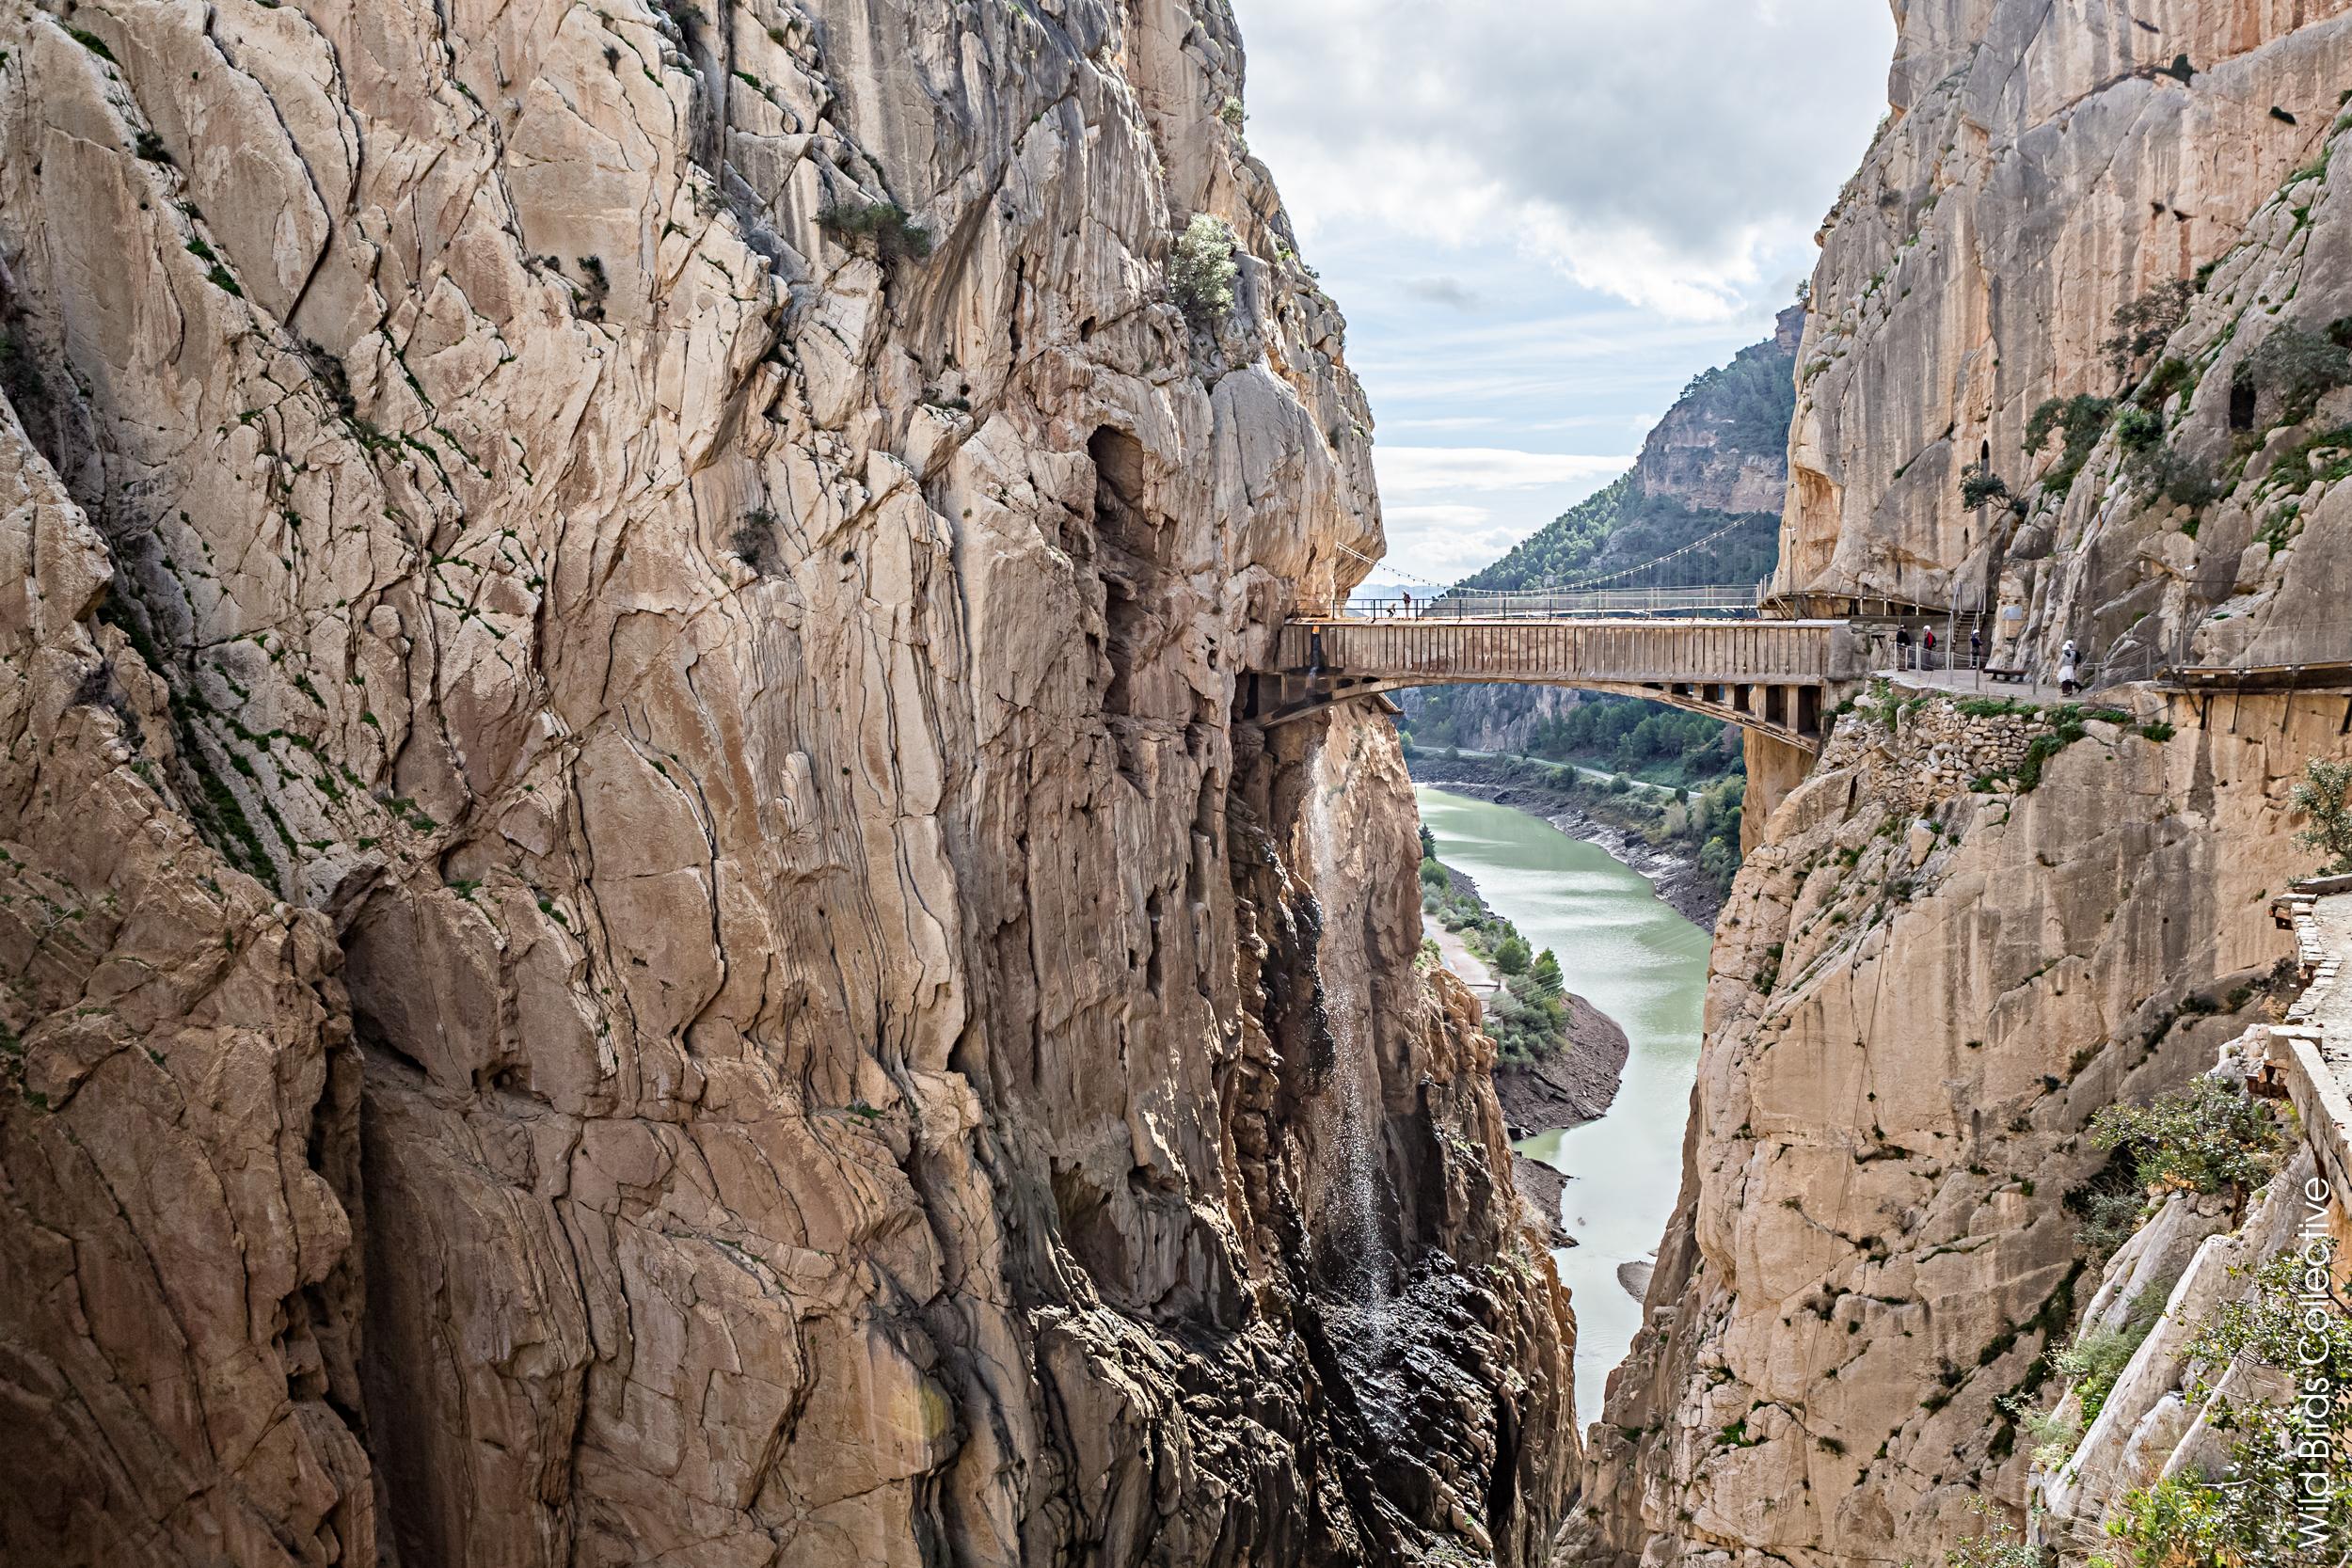 El Caminito del Rey : la via ferrata la plus dangereuse du monde